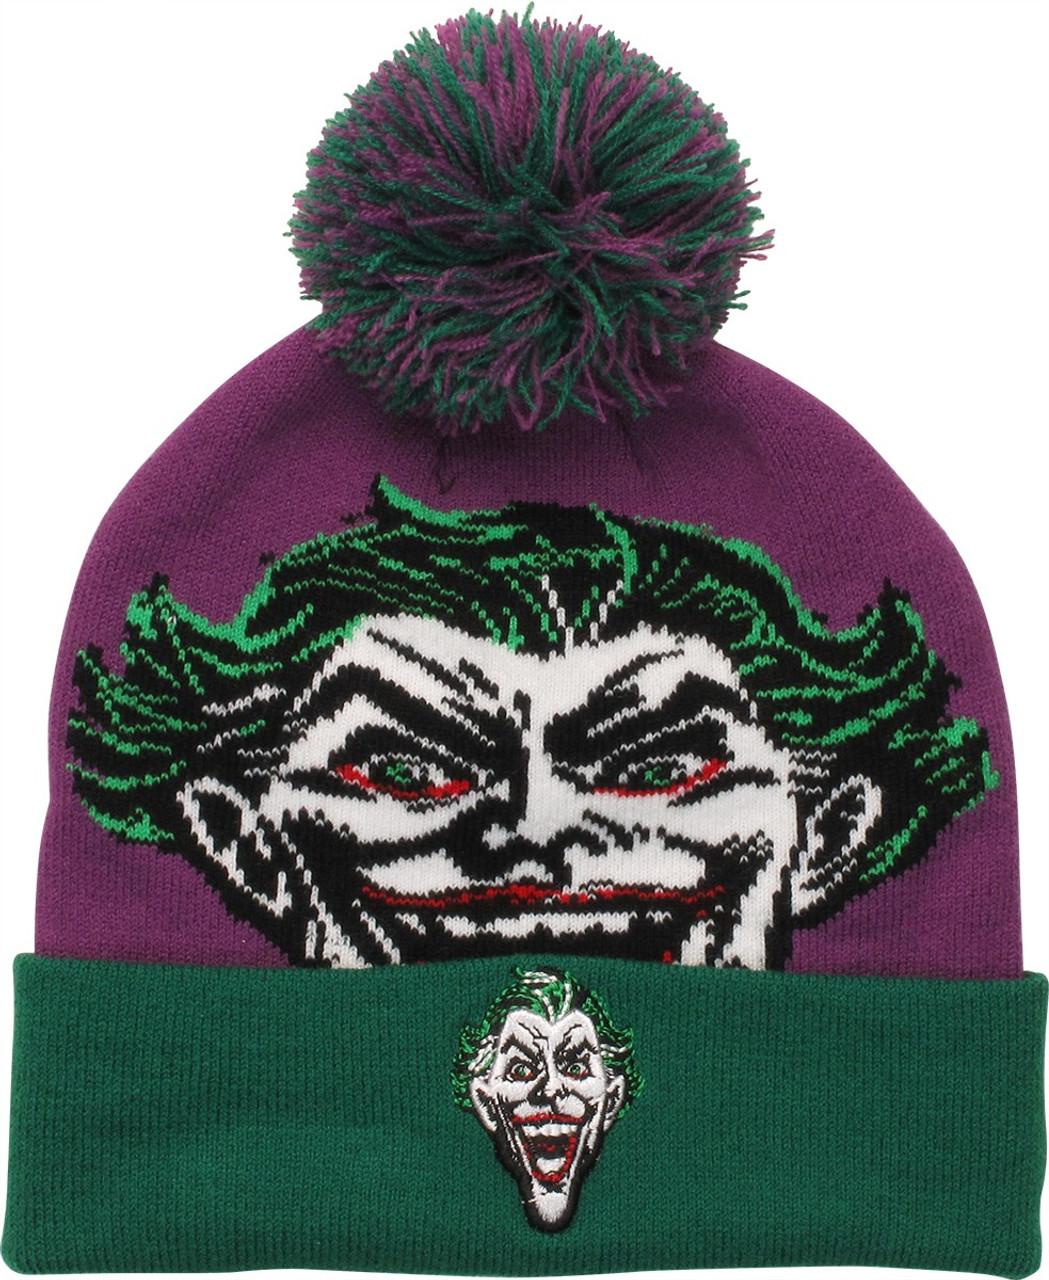 5546acd167e Joker Face Cuff Pom Beanie